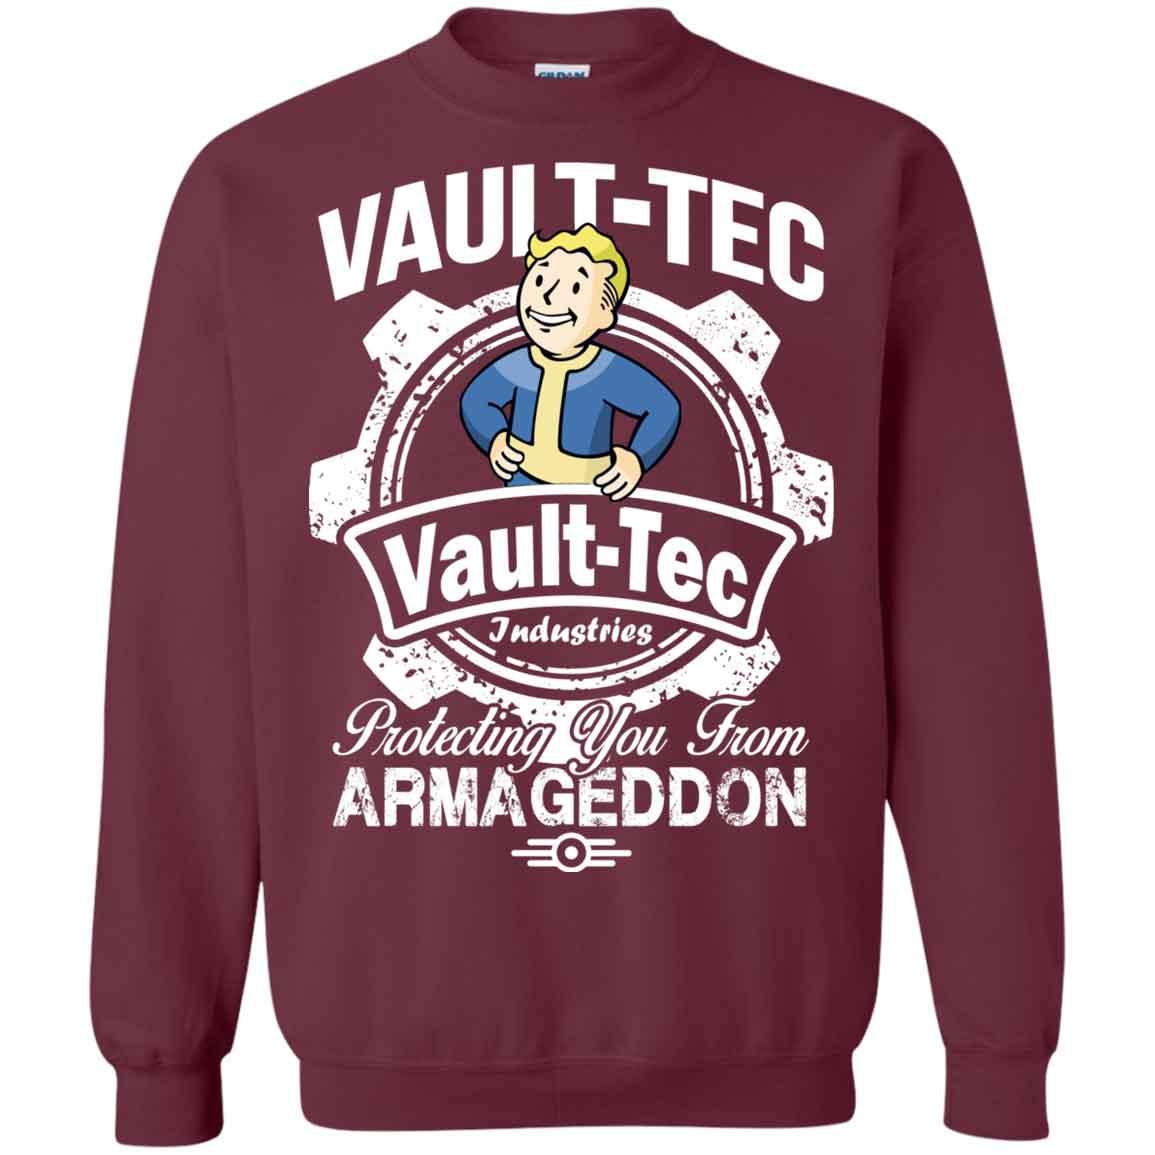 Vault Tec Christmas Sweater.Vault Tec Protecting You From Armegeddon Vault Tec Hoodies Sweatshirts